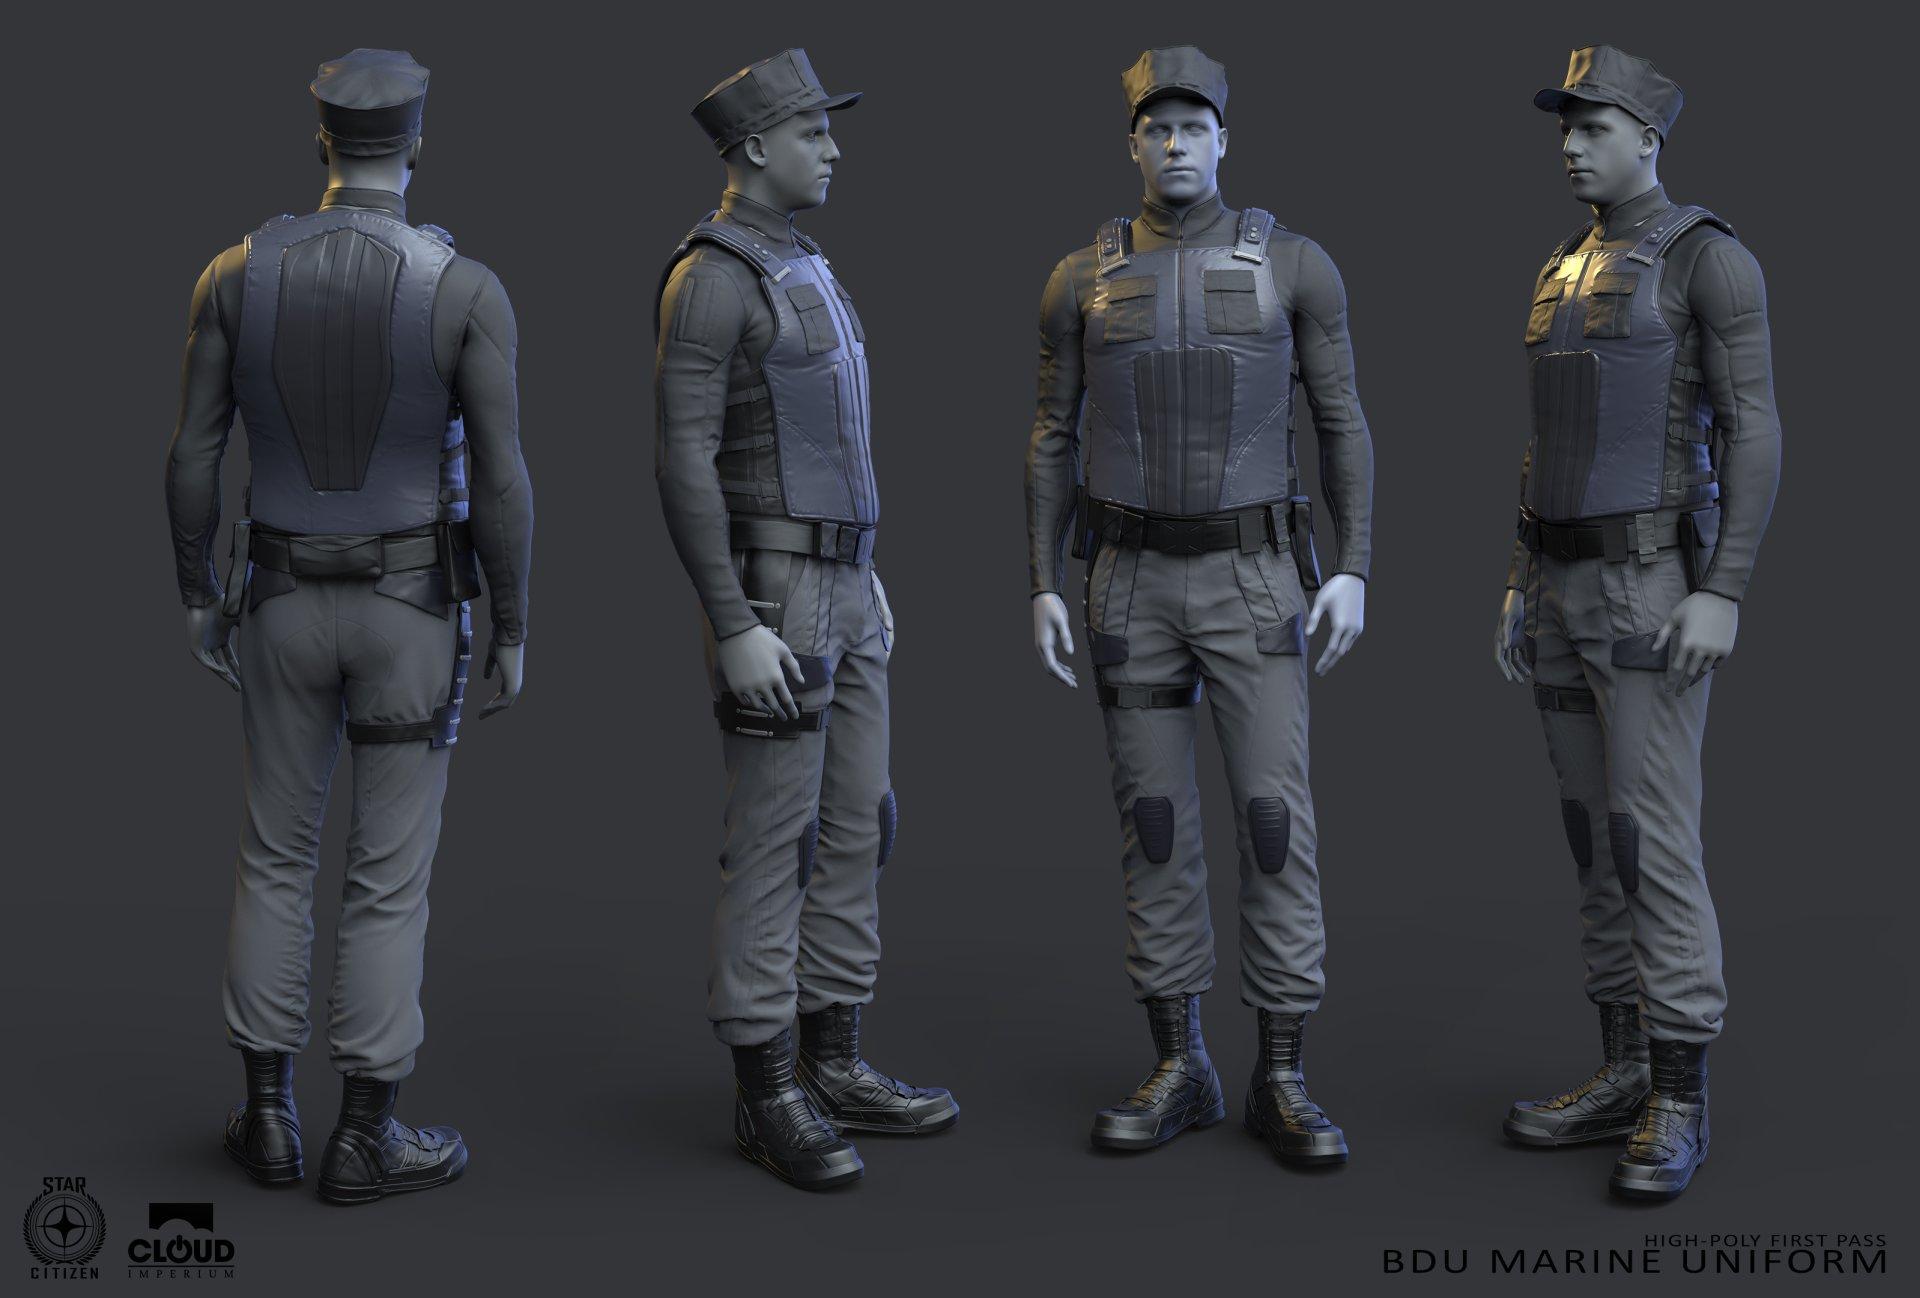 Battle Dress Uniform - Marine